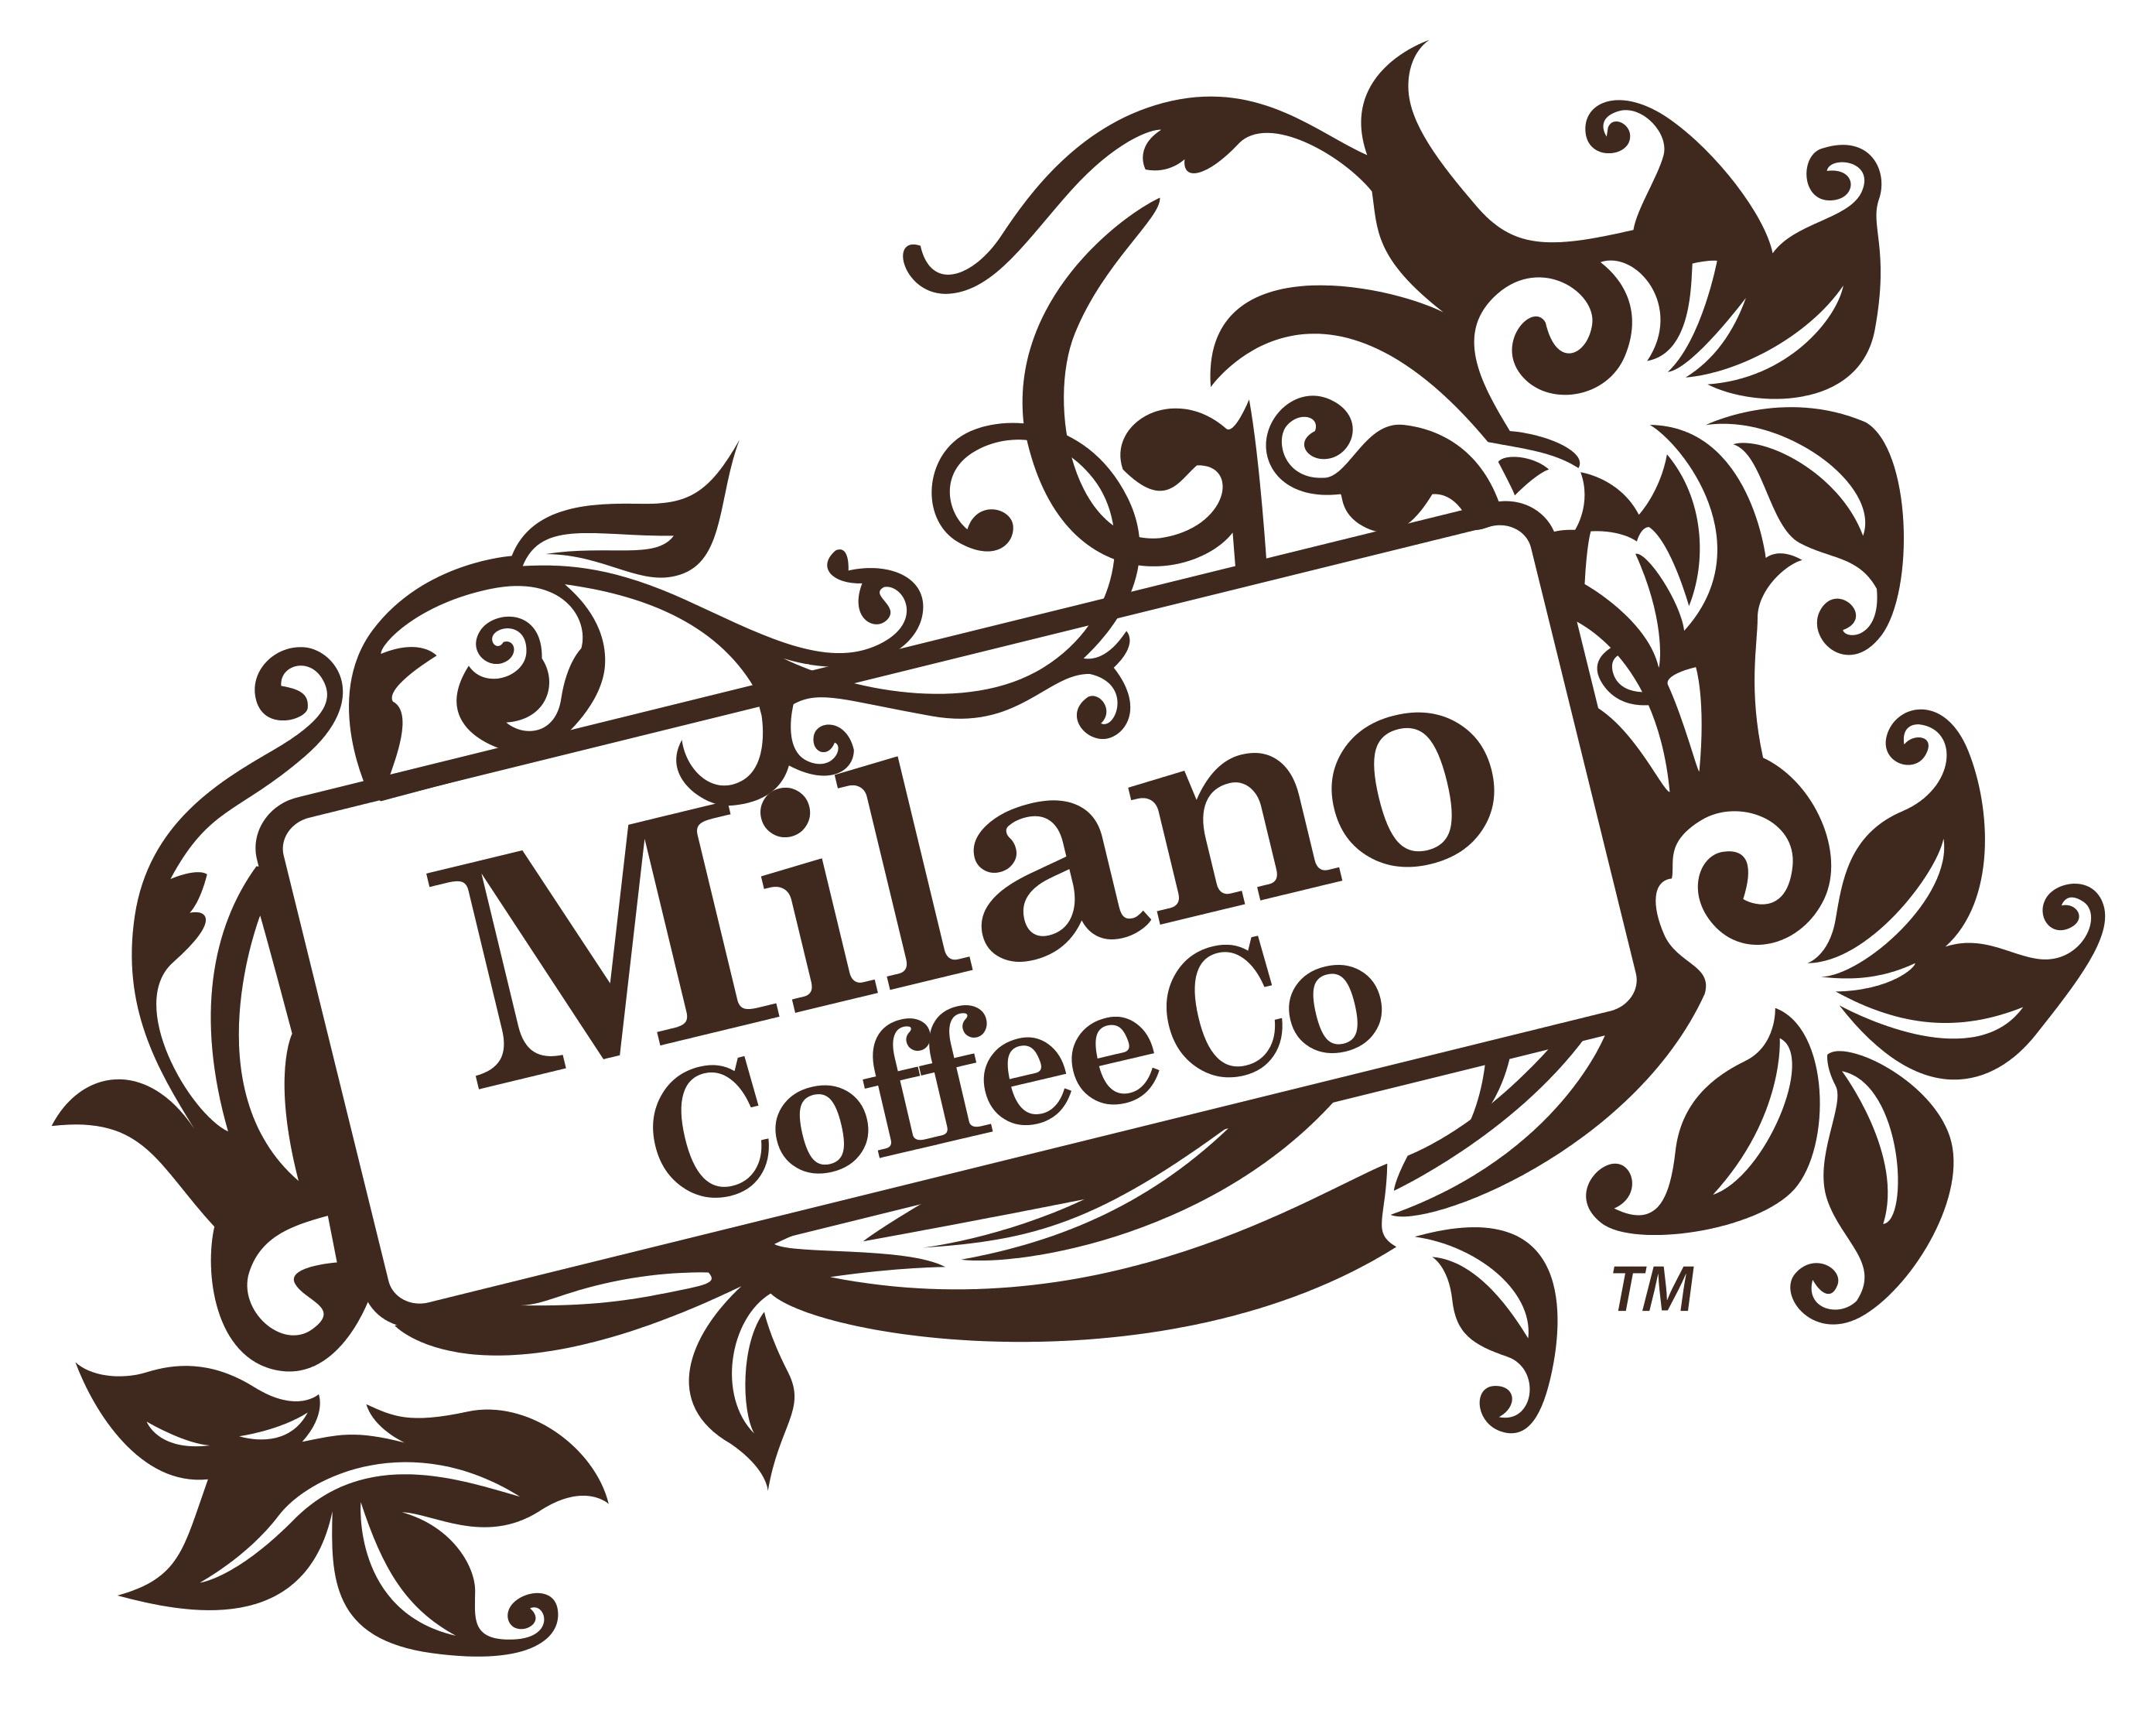 Milano Coffee Company